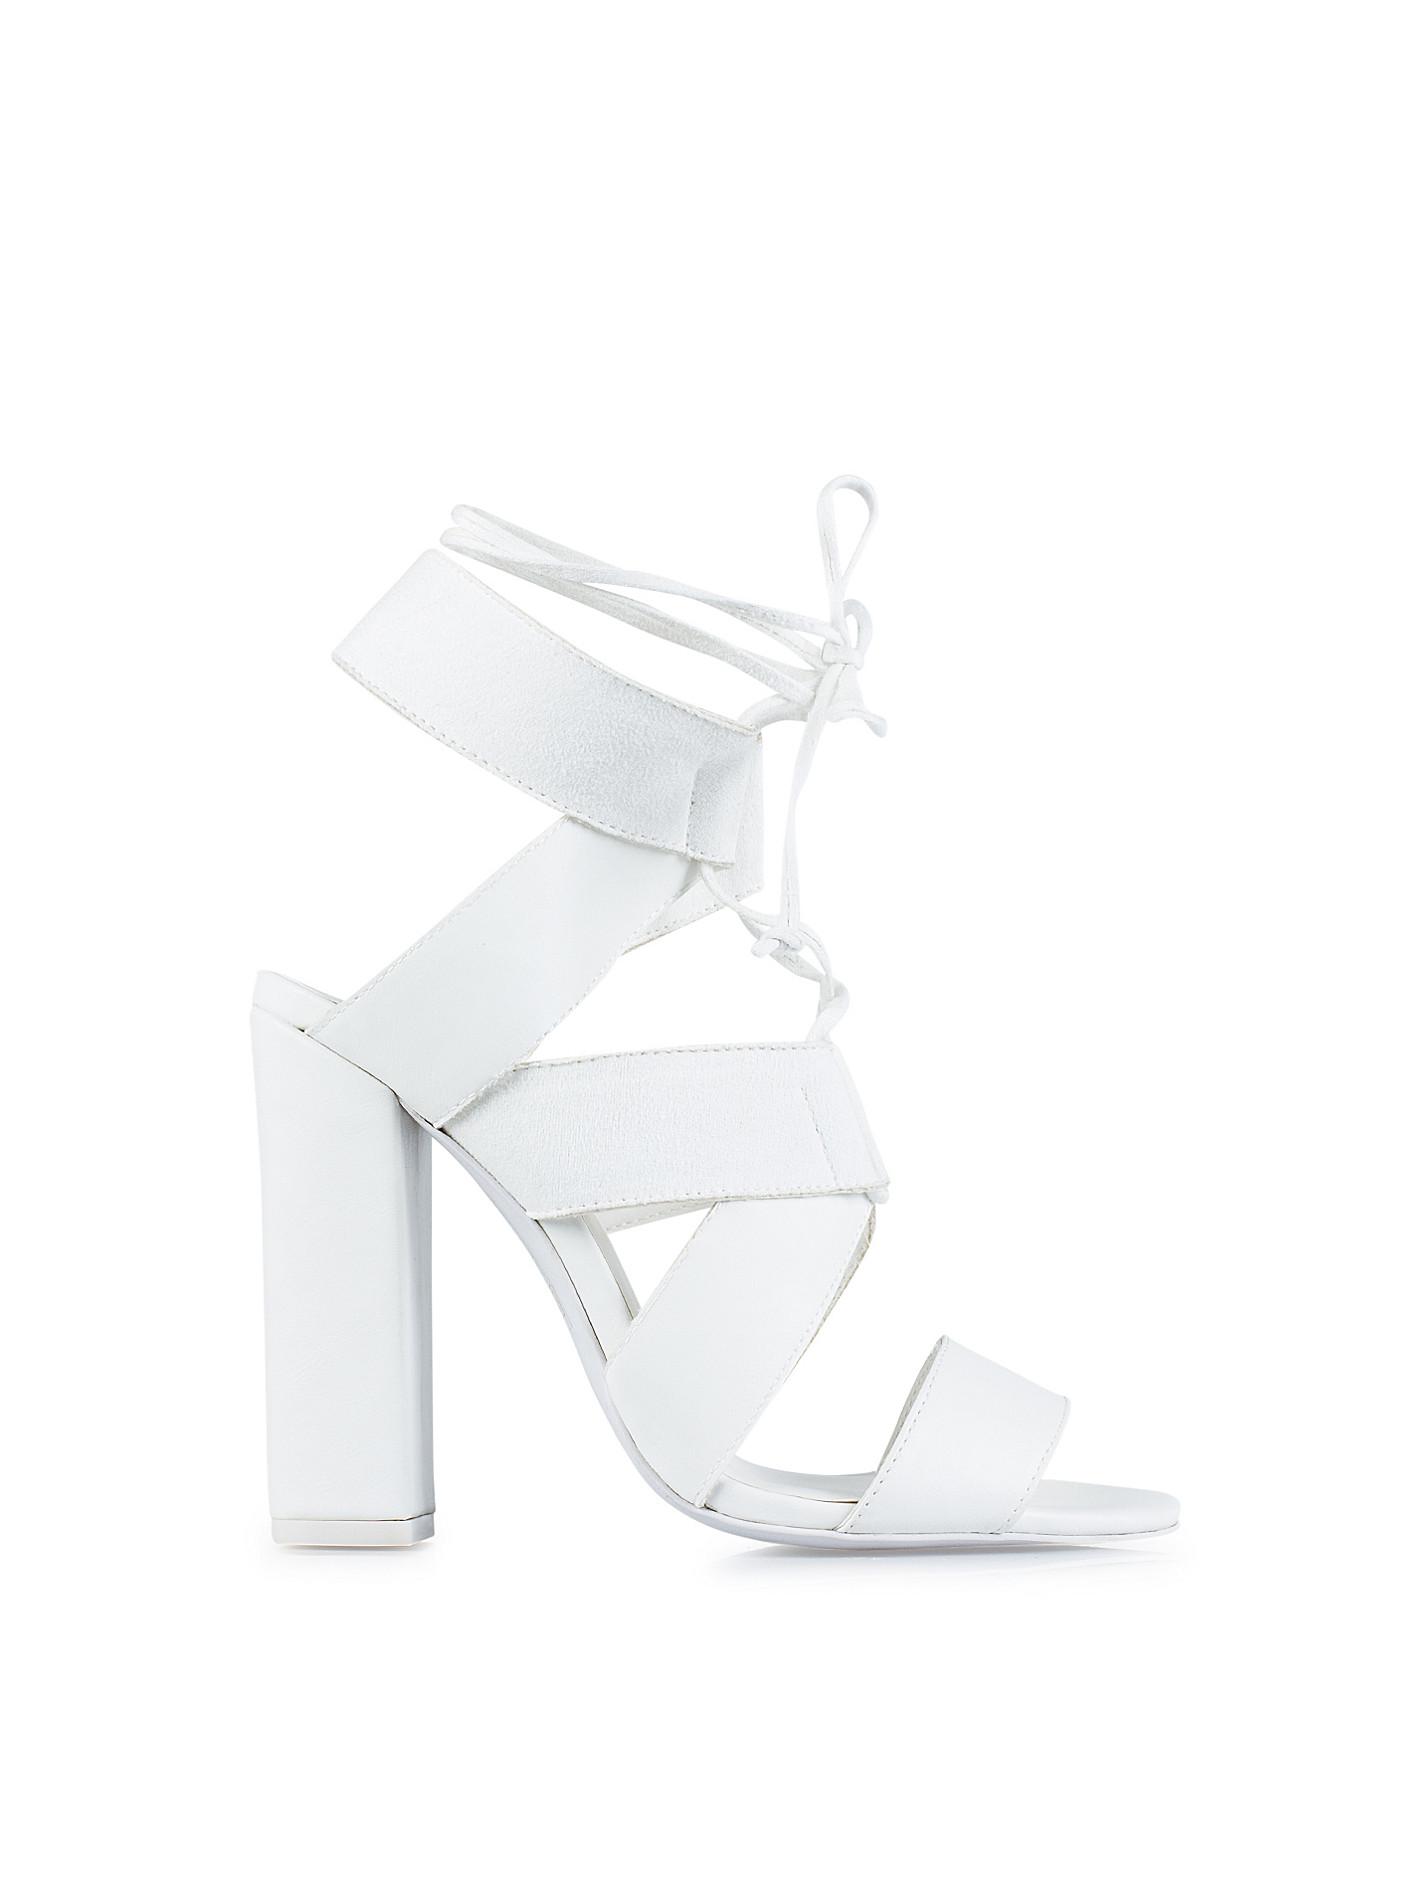 nelly sale, block heel sale, block heel shoes, designer shoe sale, lovesales,